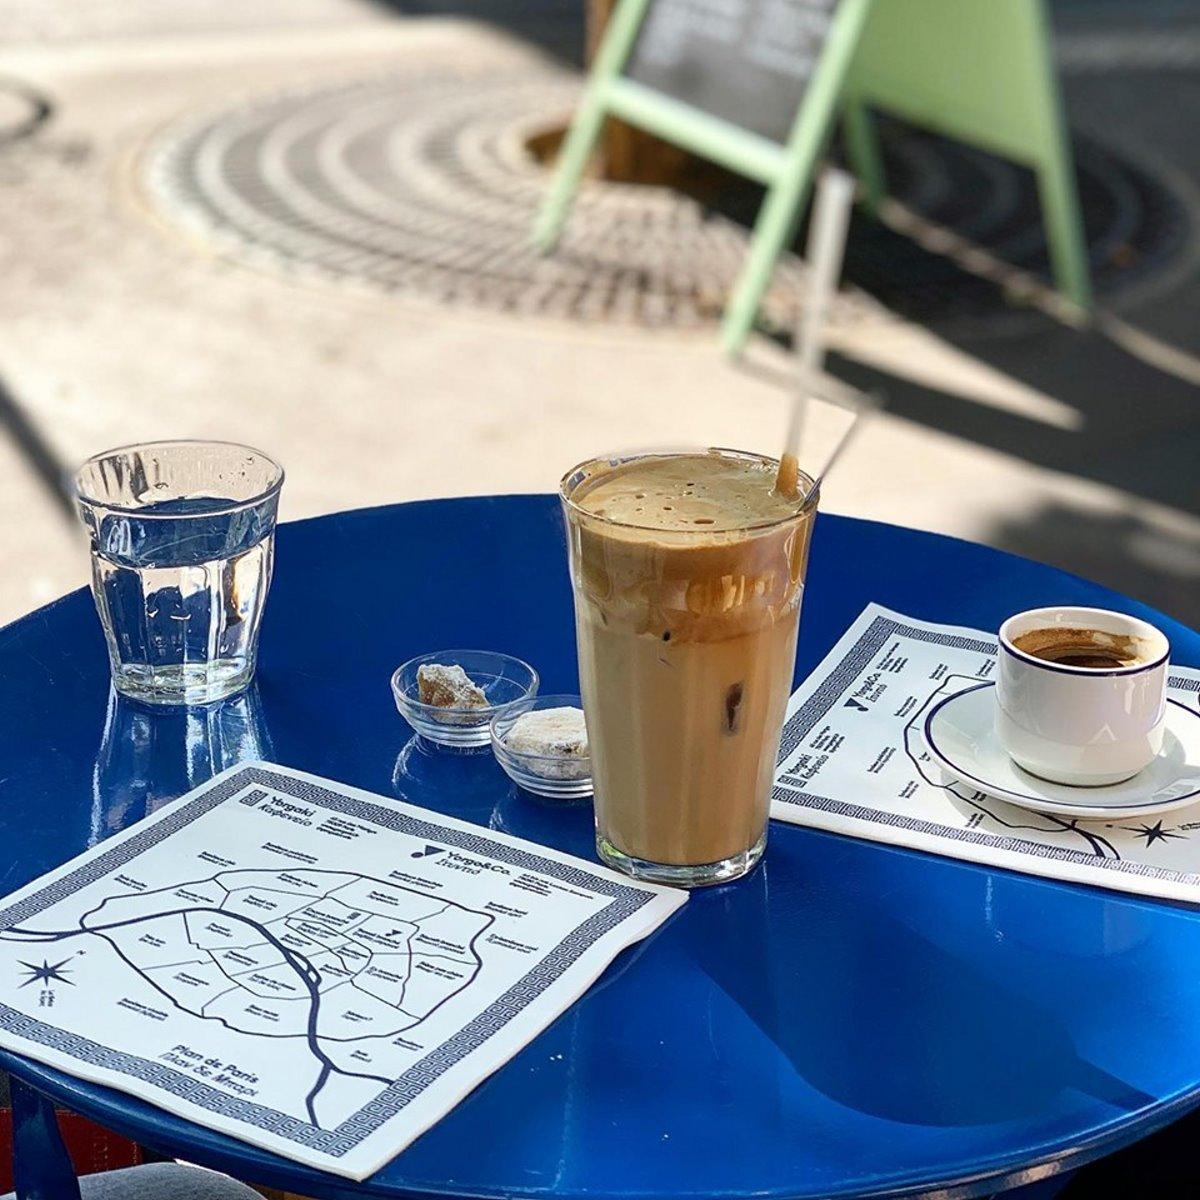 Yorgaki καφέ στο παρίσι παραδοσιακός καφές  τραπεζάκι με καφέ ελληνικό και κουλουράκι